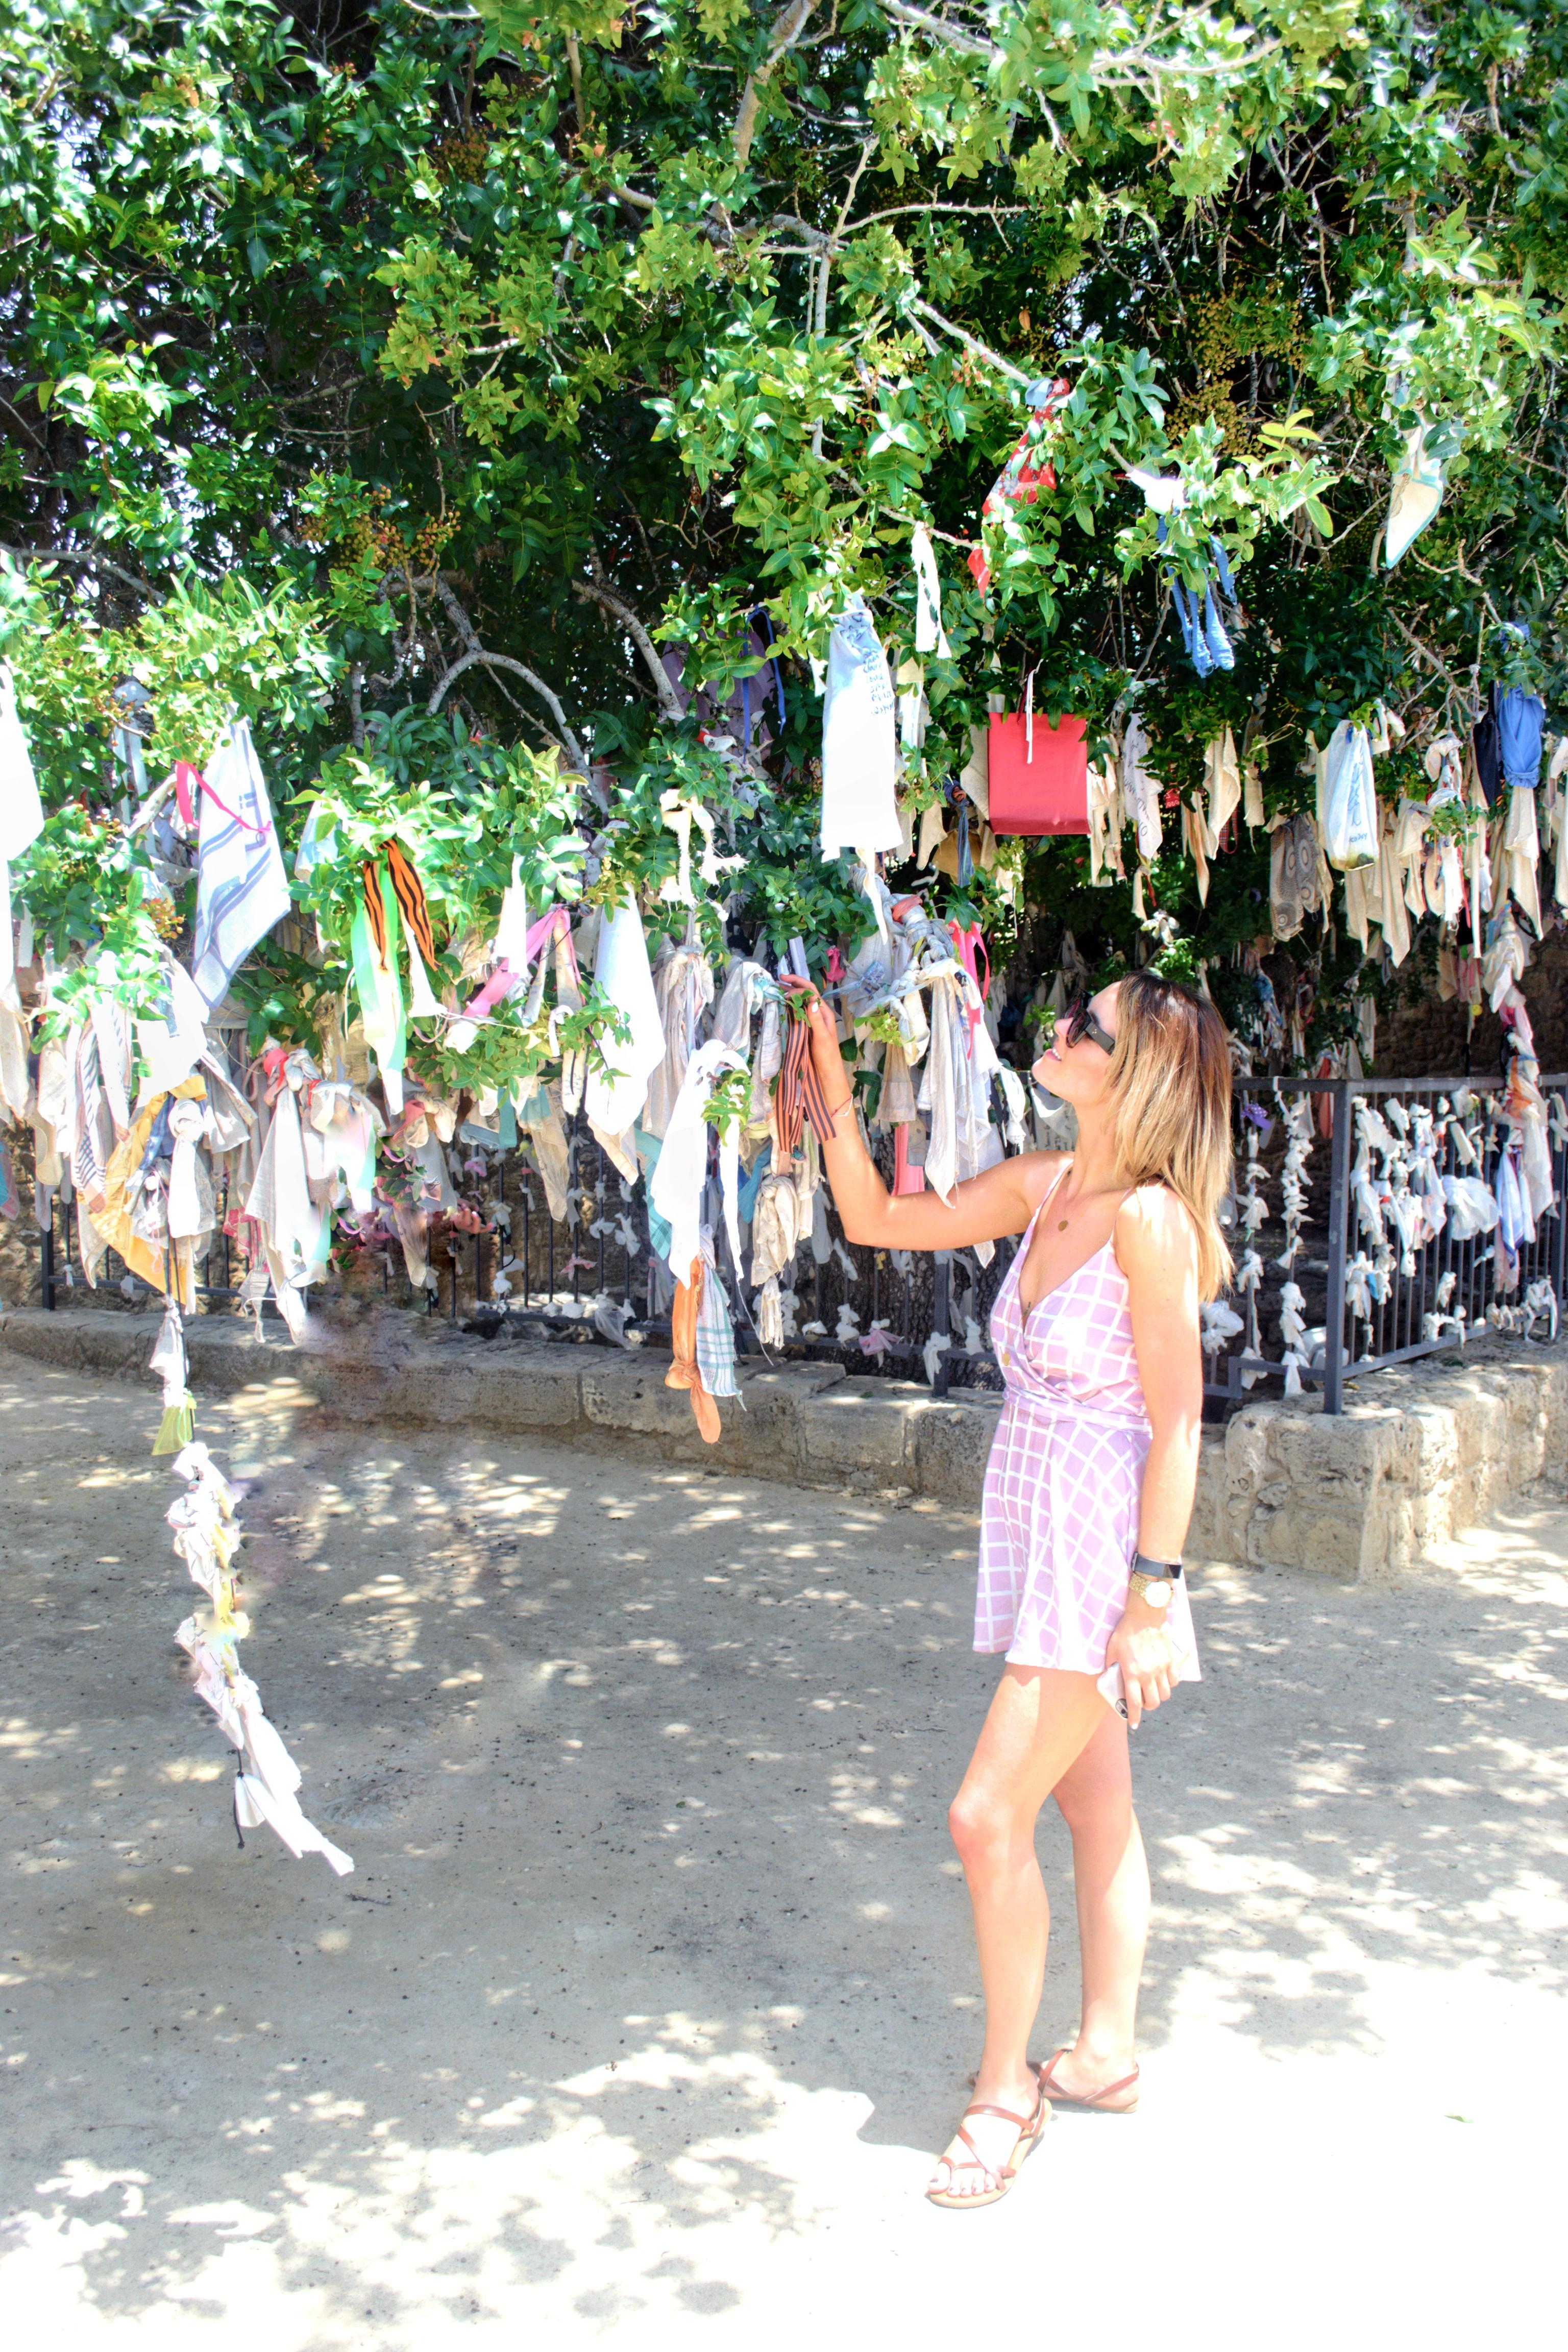 The Hanky Tree Paphos